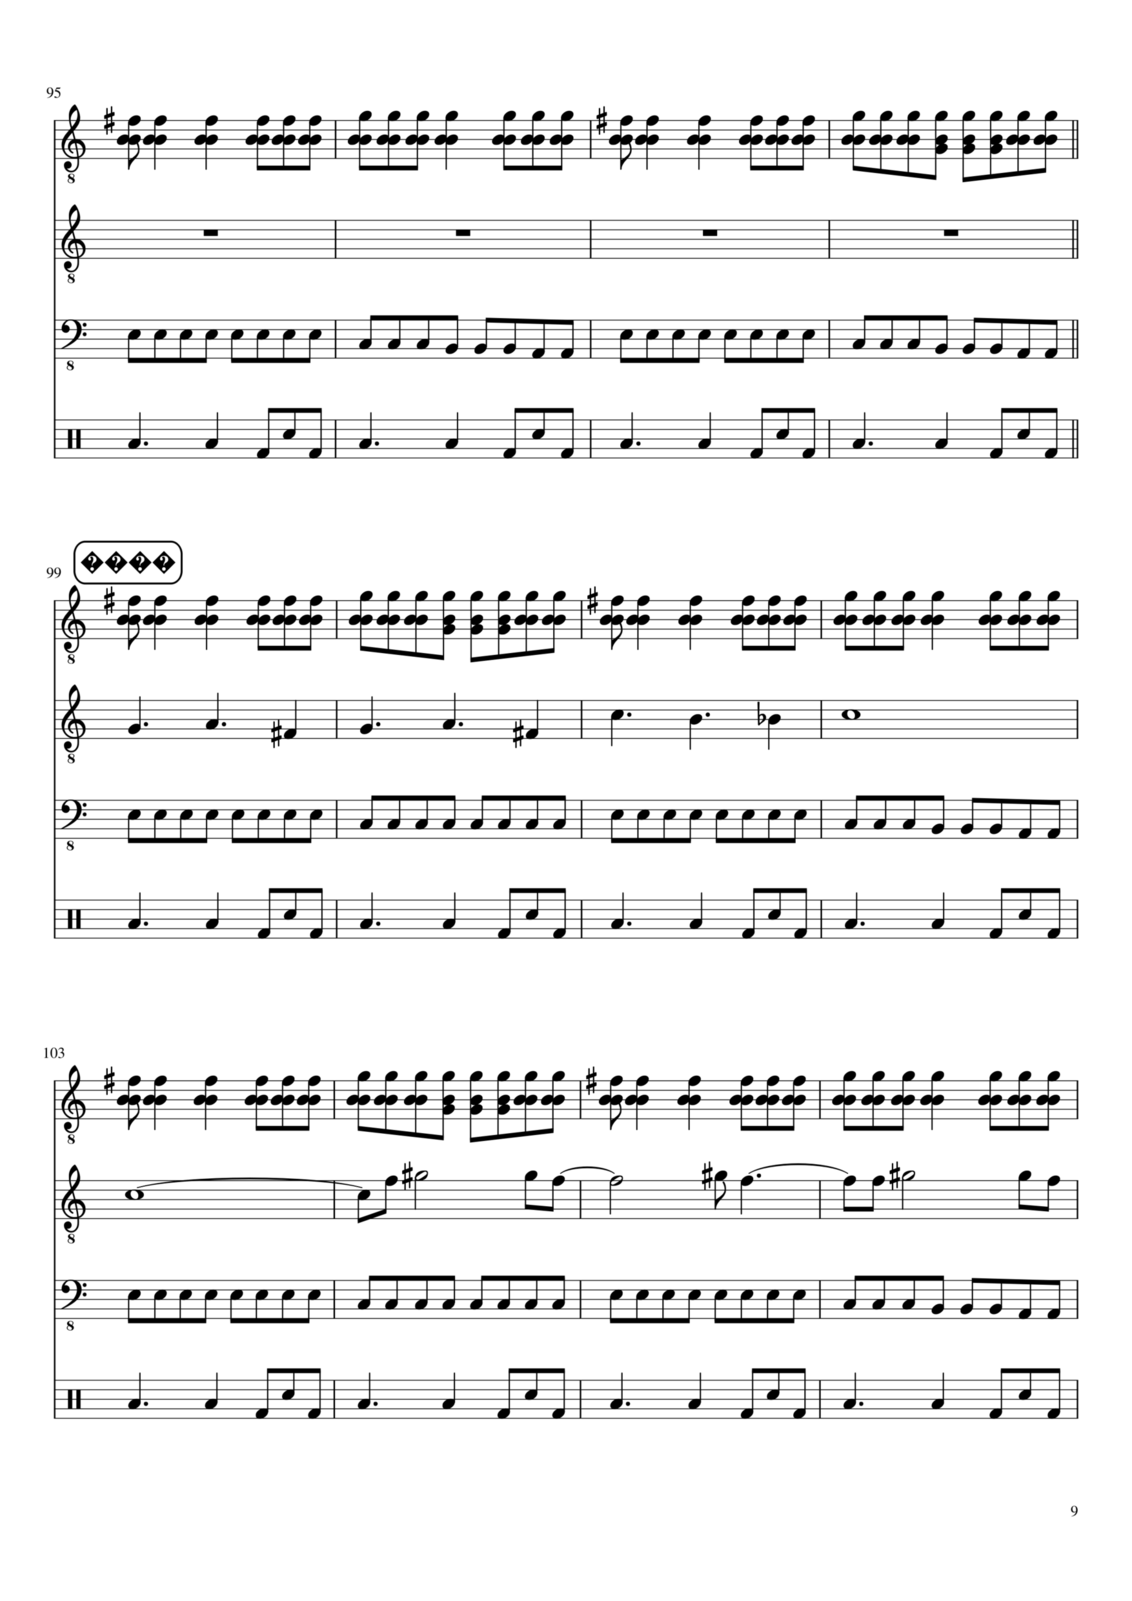 Deklassirovannyim elementam slide, Image 9